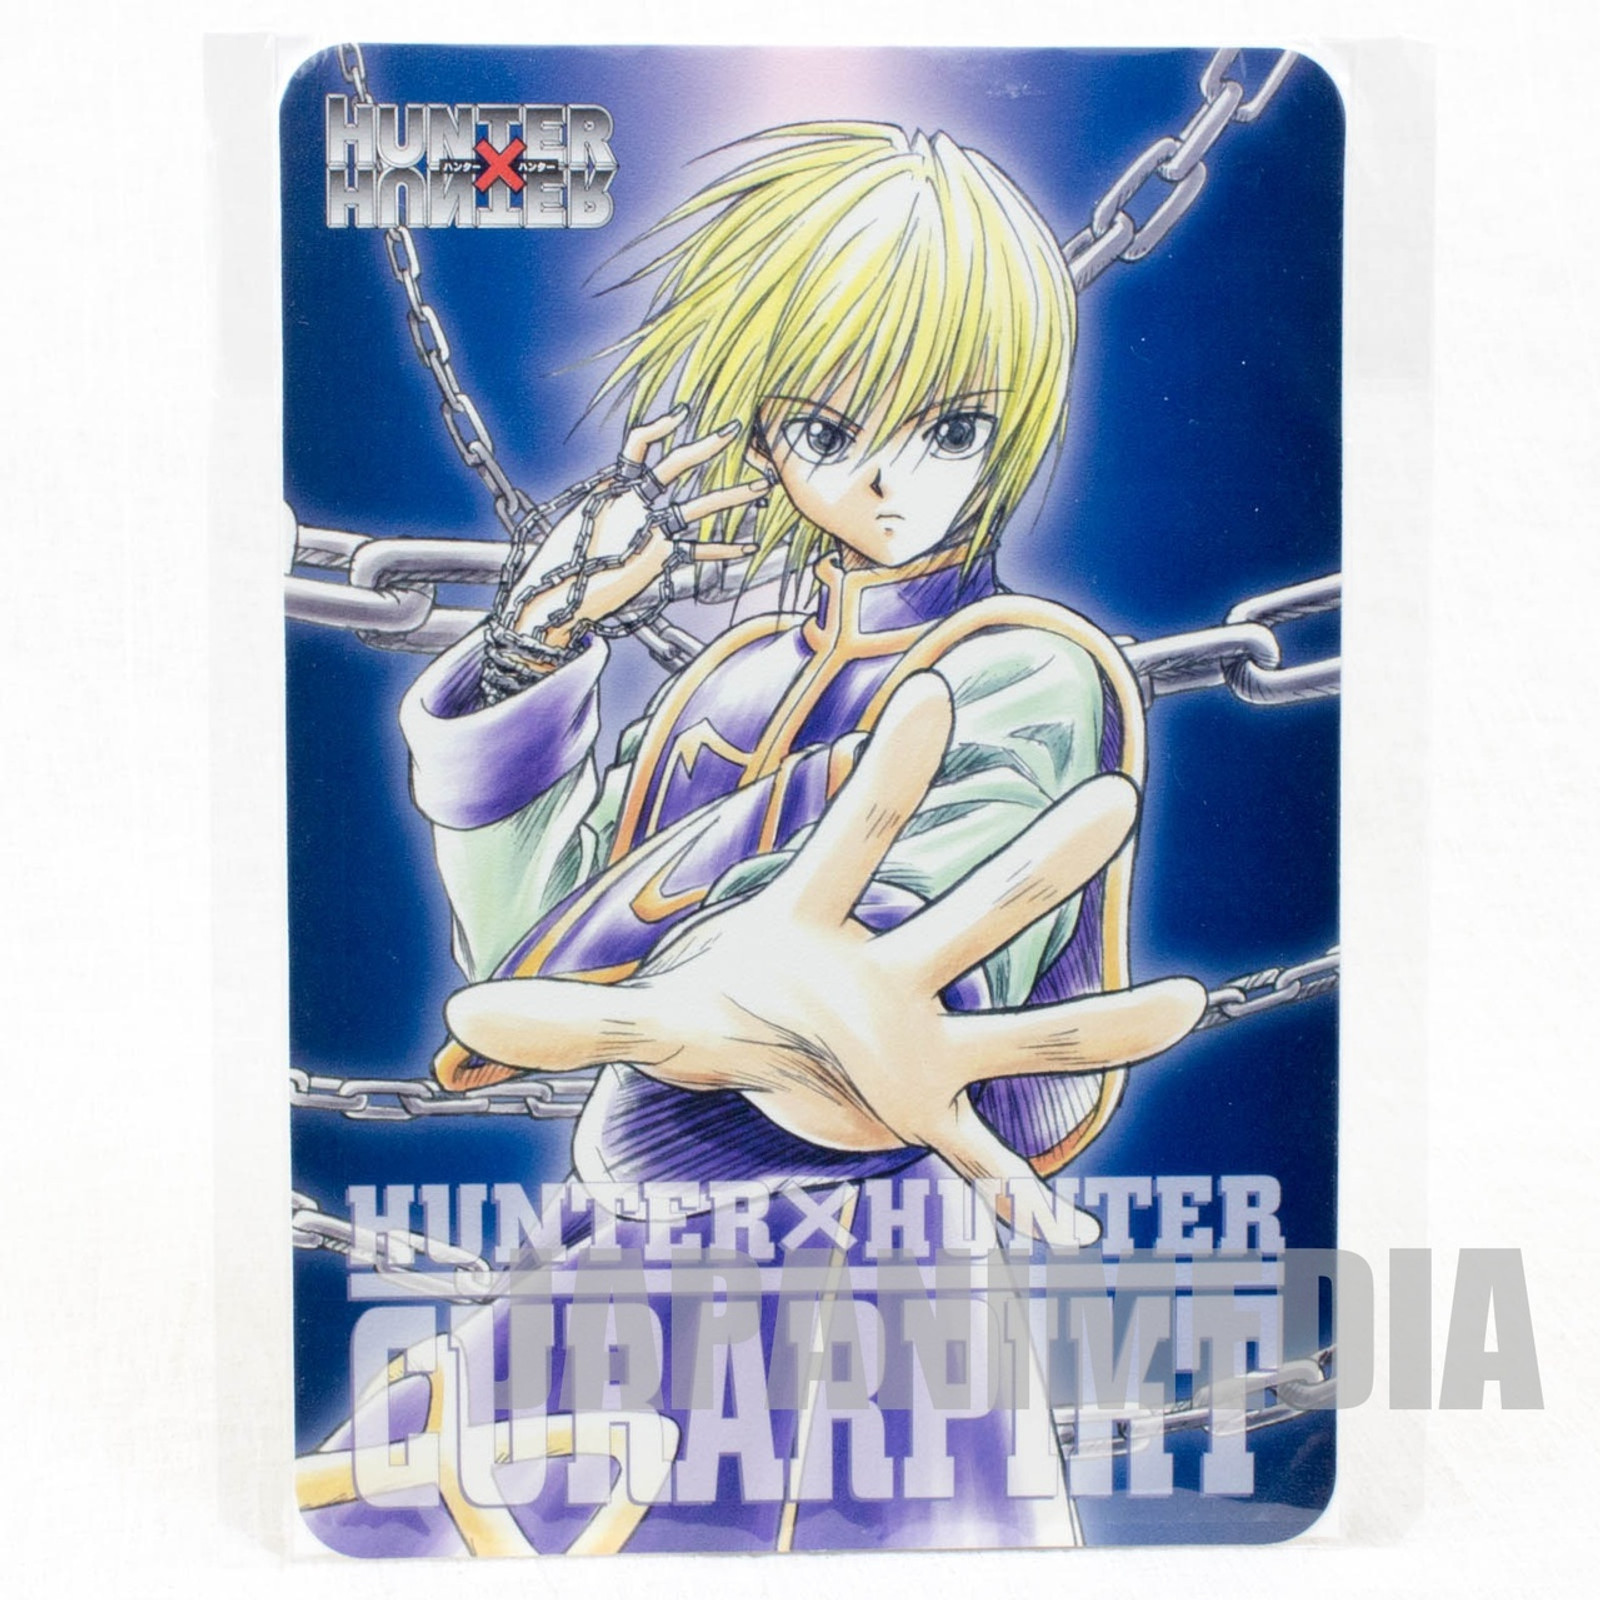 Hunter x Hunter Kurapika Jumbo Card Paddass BANDAI JAPAN ANIME MANGA #1